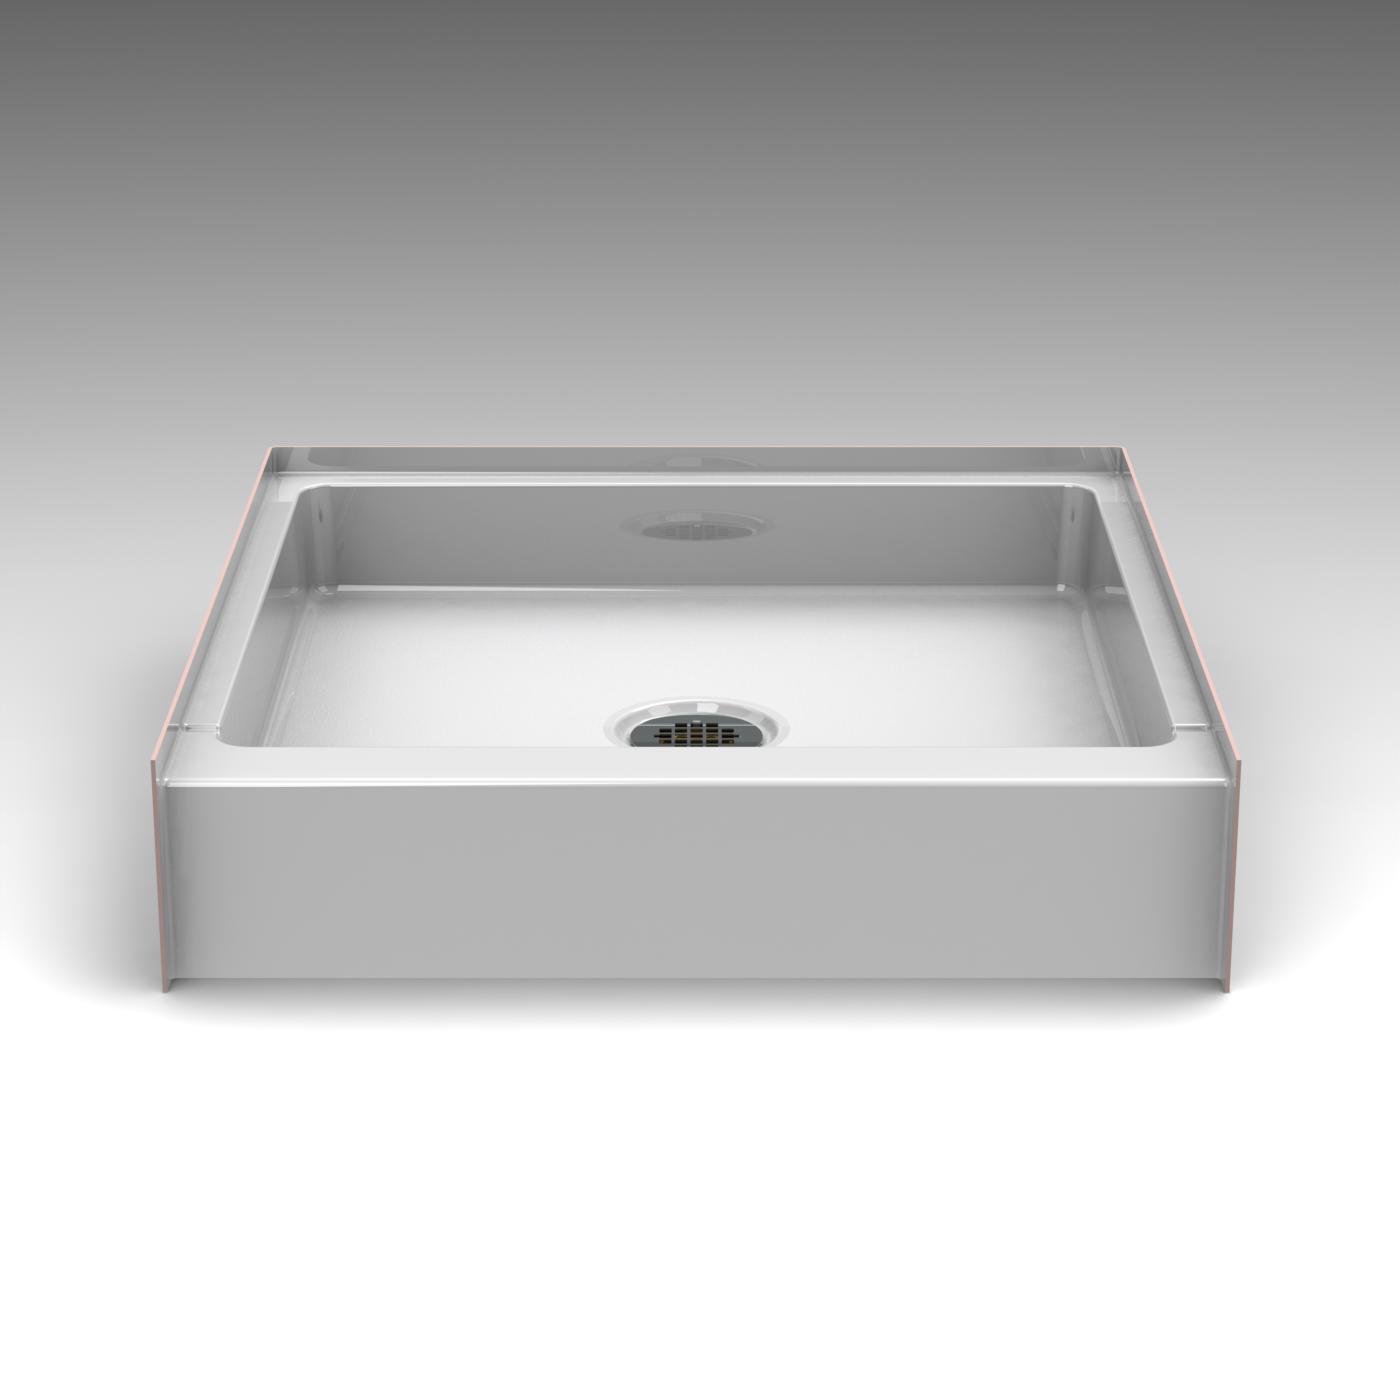 Curbed Shower Pan - Seamless 30x30 - Best Bath Showroom